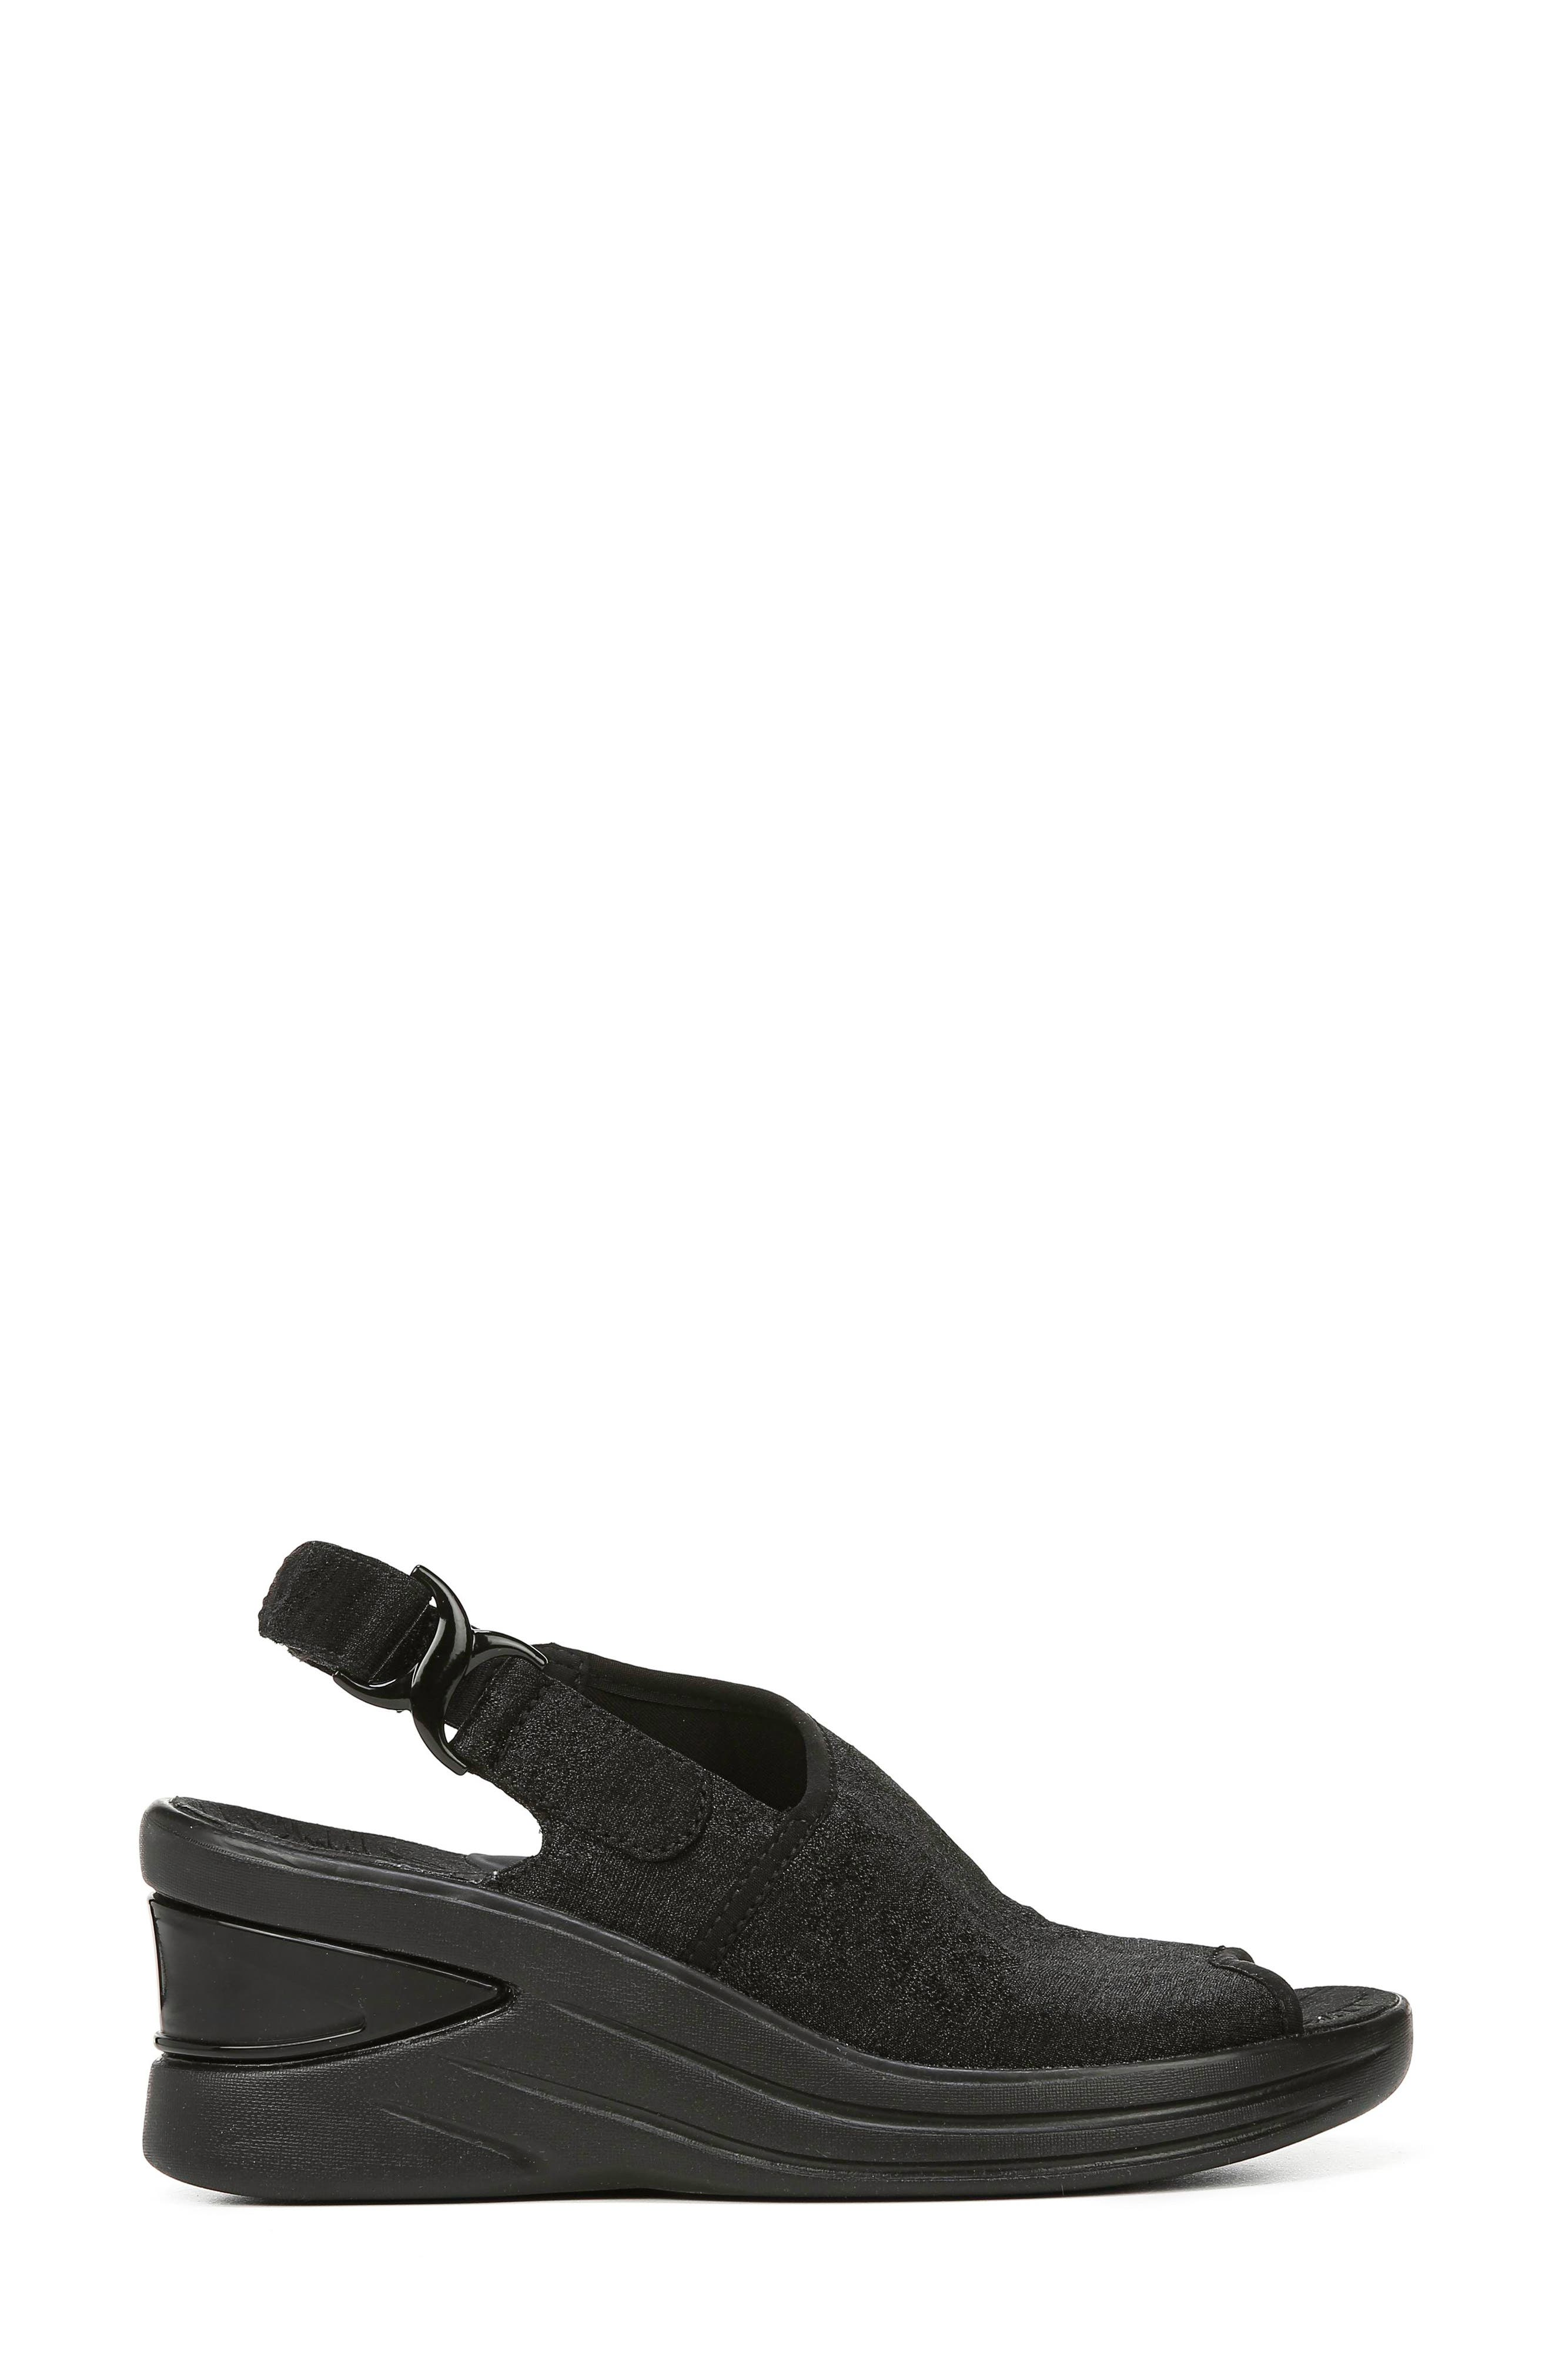 BZEES, Vivia Slingback Wedge Sandal, Alternate thumbnail 3, color, BLACK FABRIC